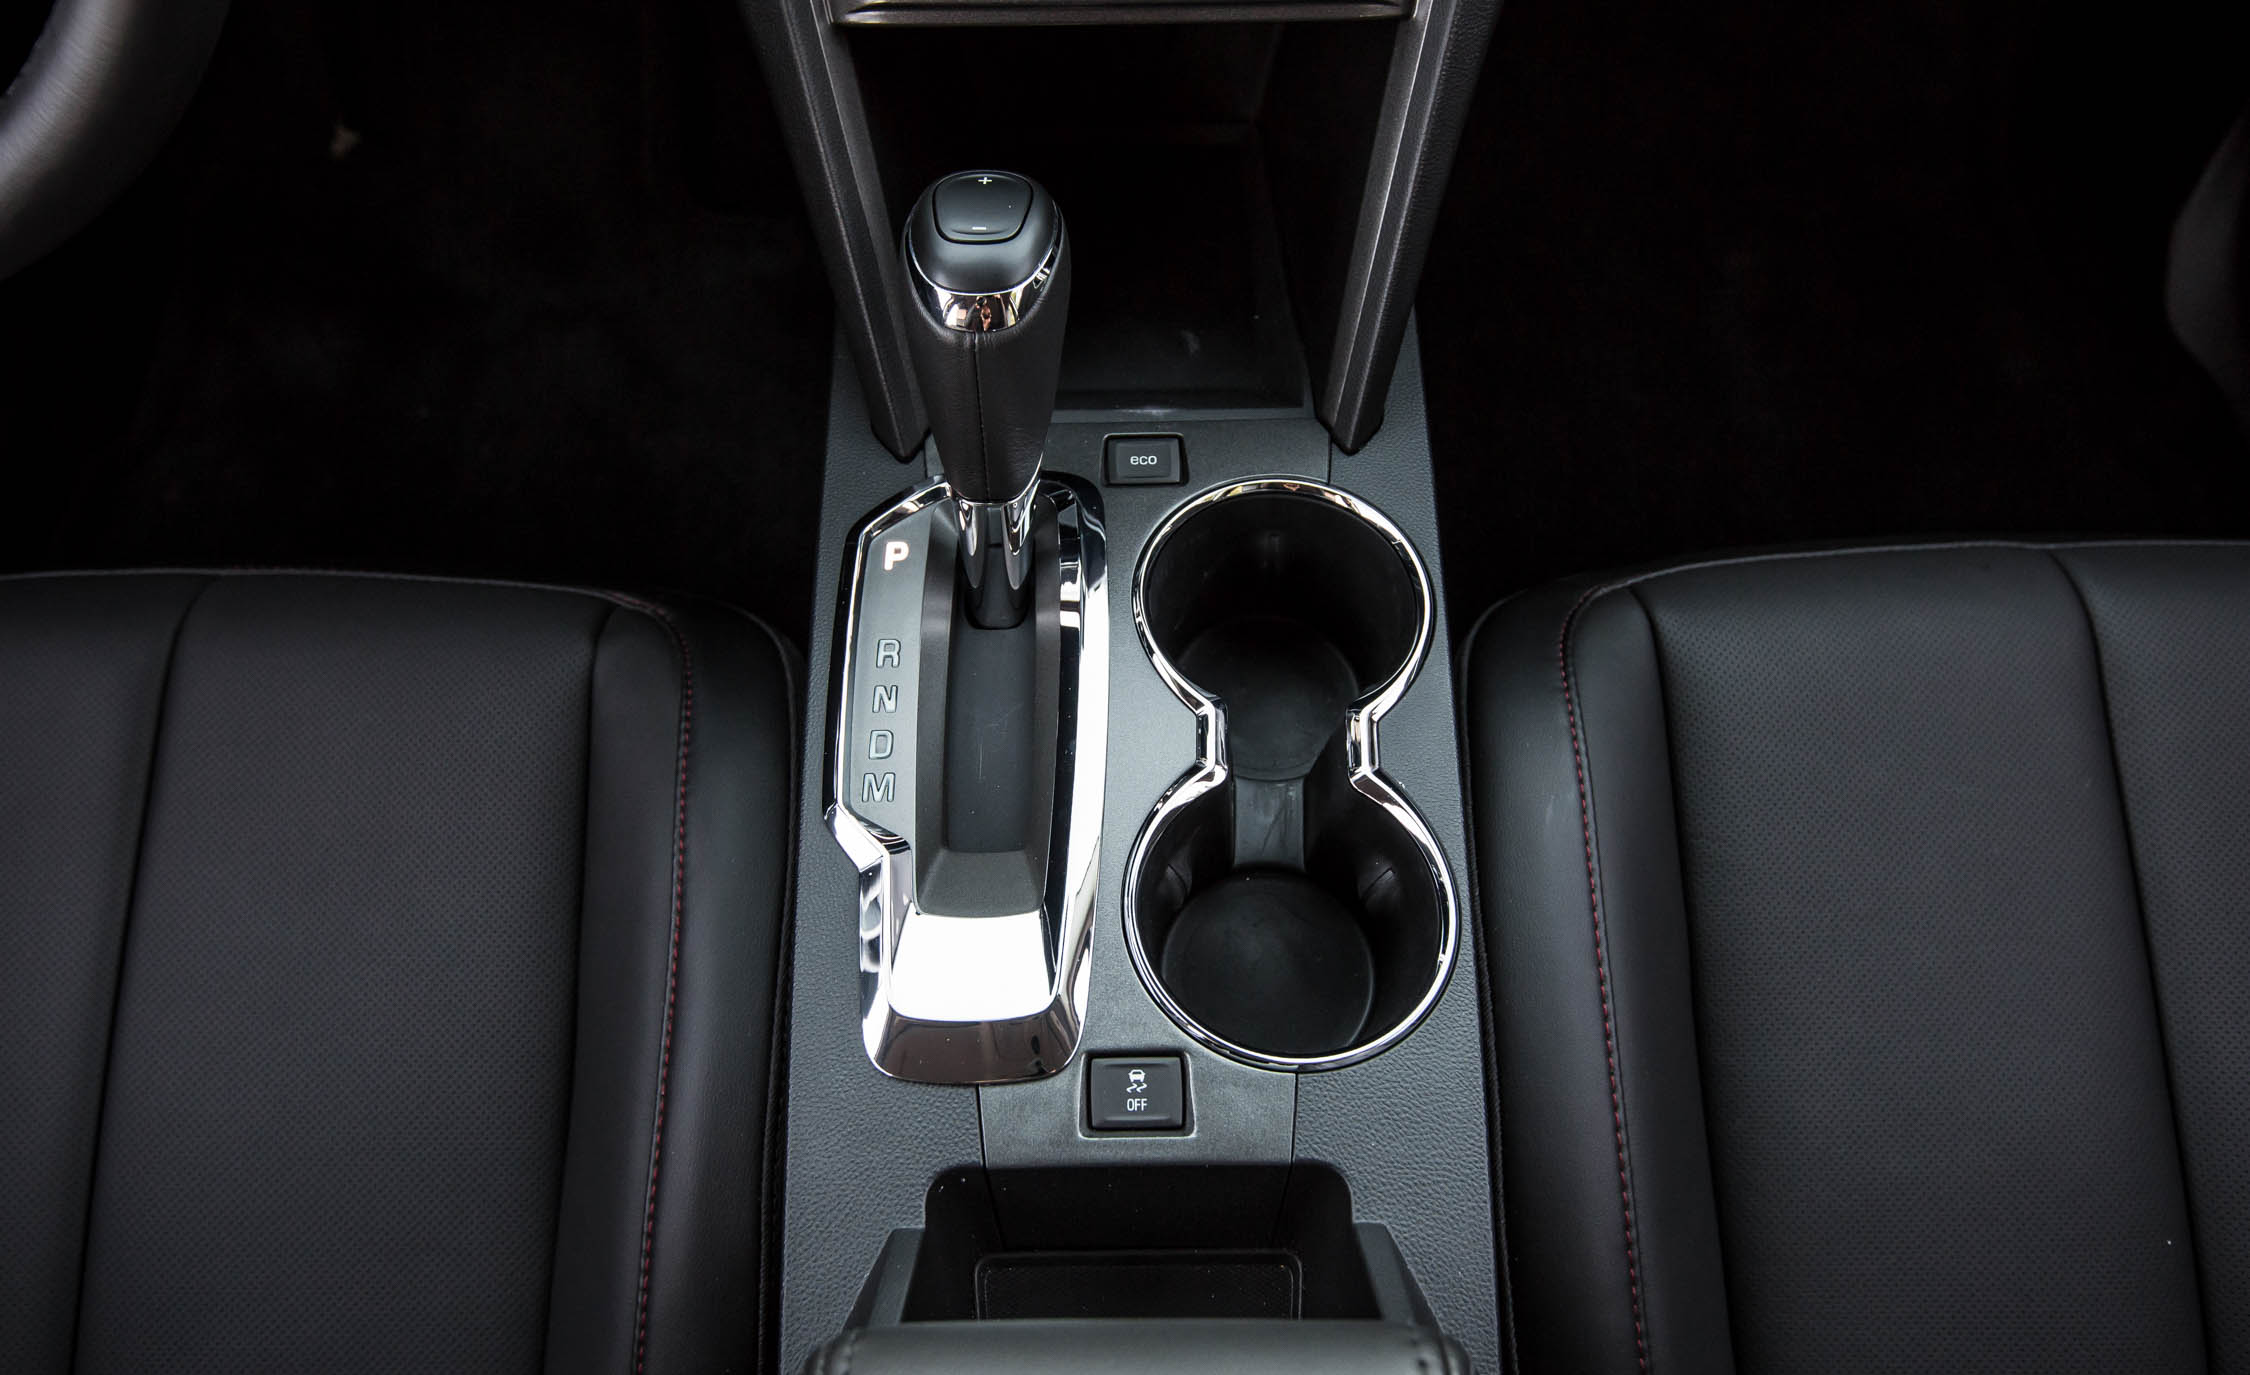 2016 Chevrolet Equinox LTZ (Photo 7 of 25)